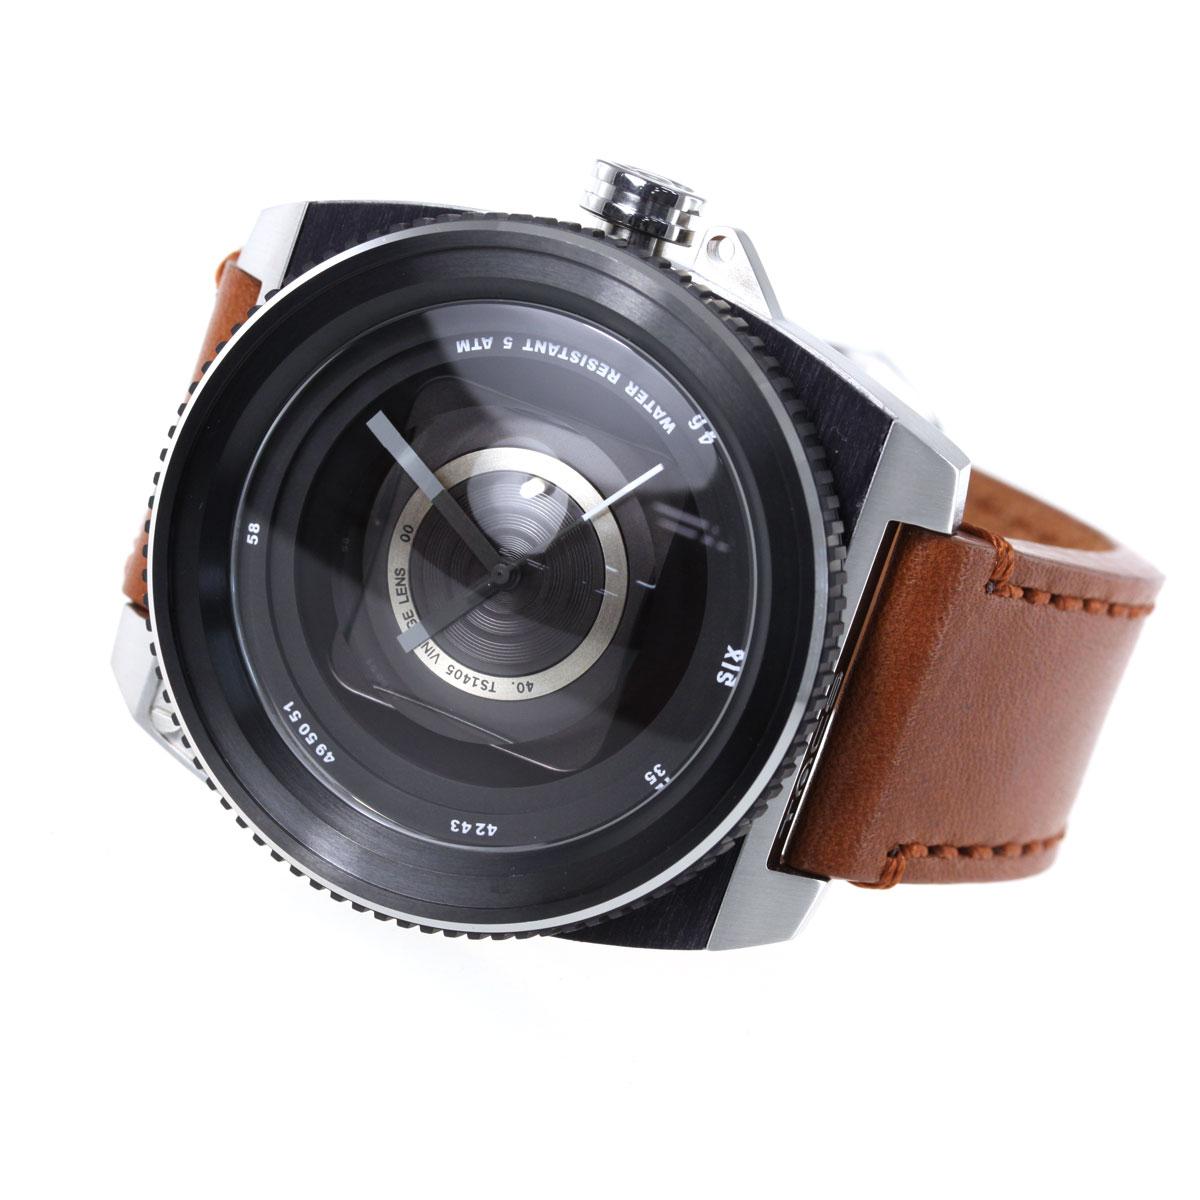 TACS タックス 腕時計 メンズ ヴィンテージレンズ VINTAGE LENS TS1405B